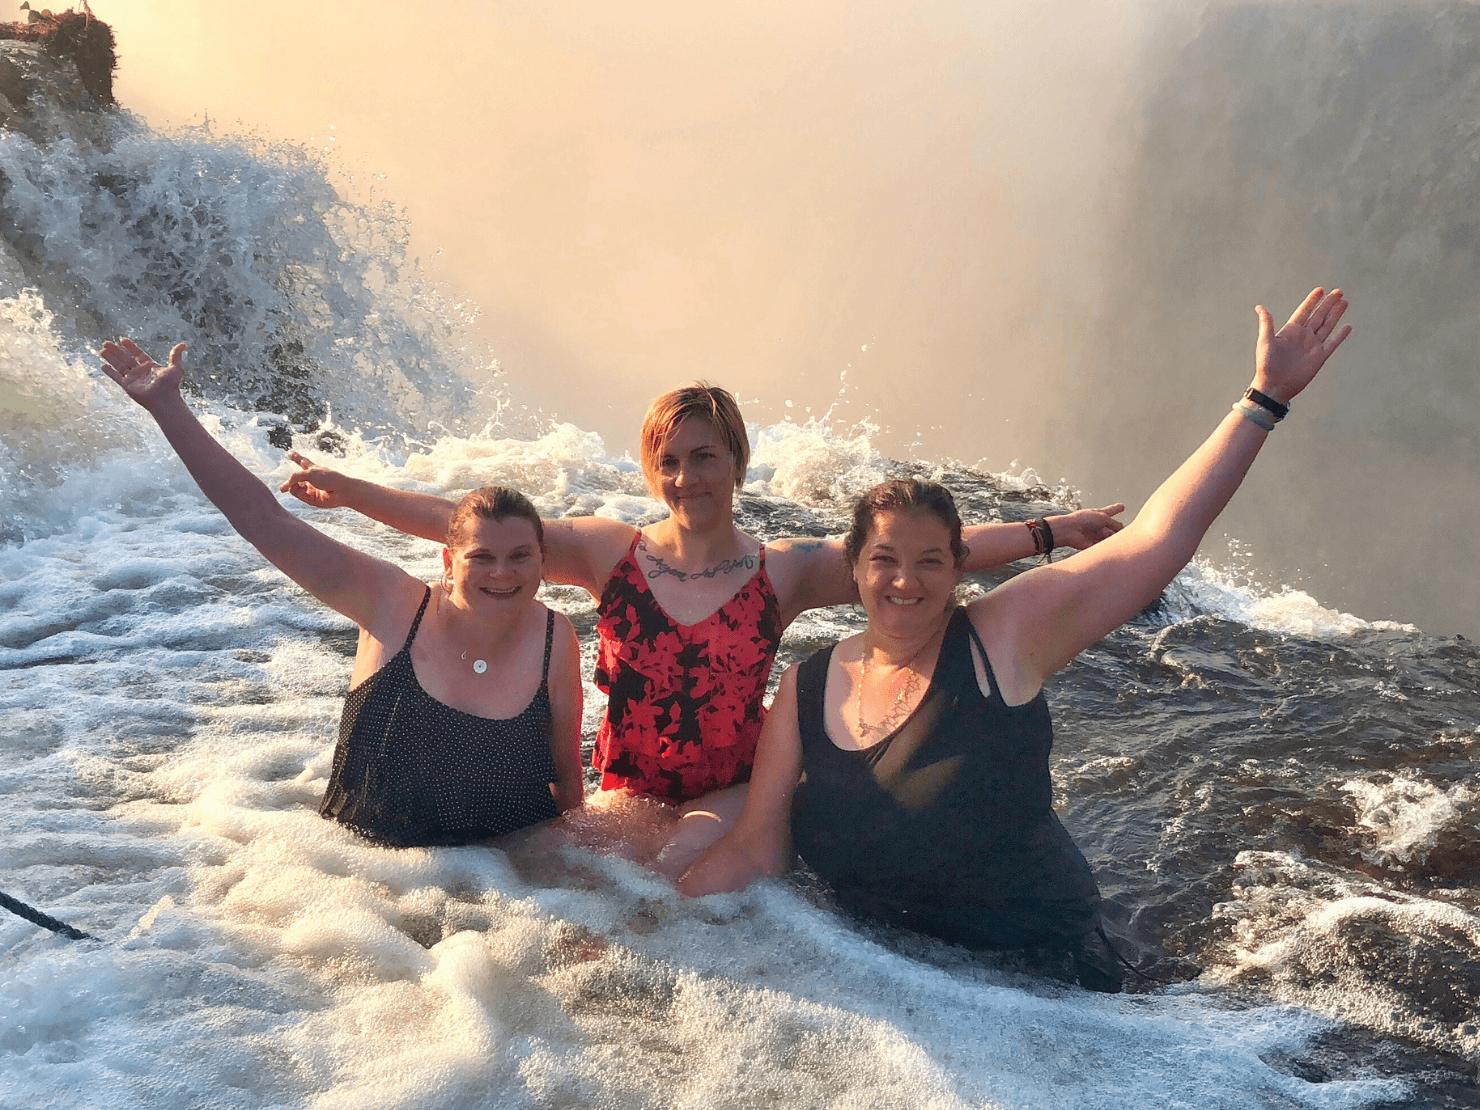 Angel's Pool, Zambia